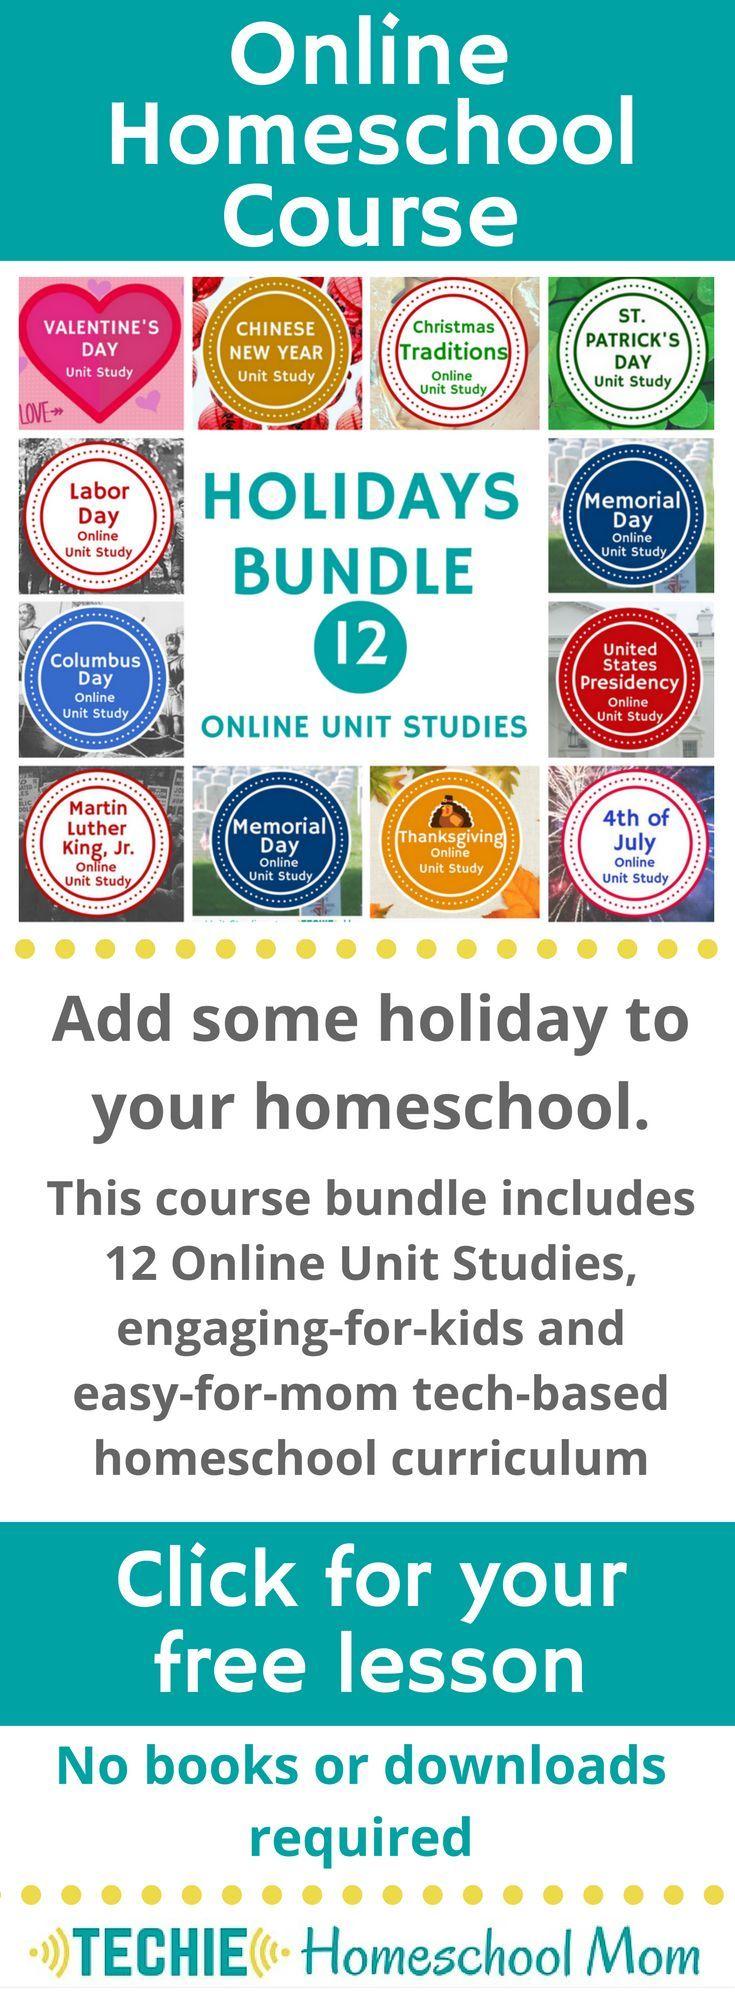 5592 best learning stuff :) images on Pinterest | Homeschool ...